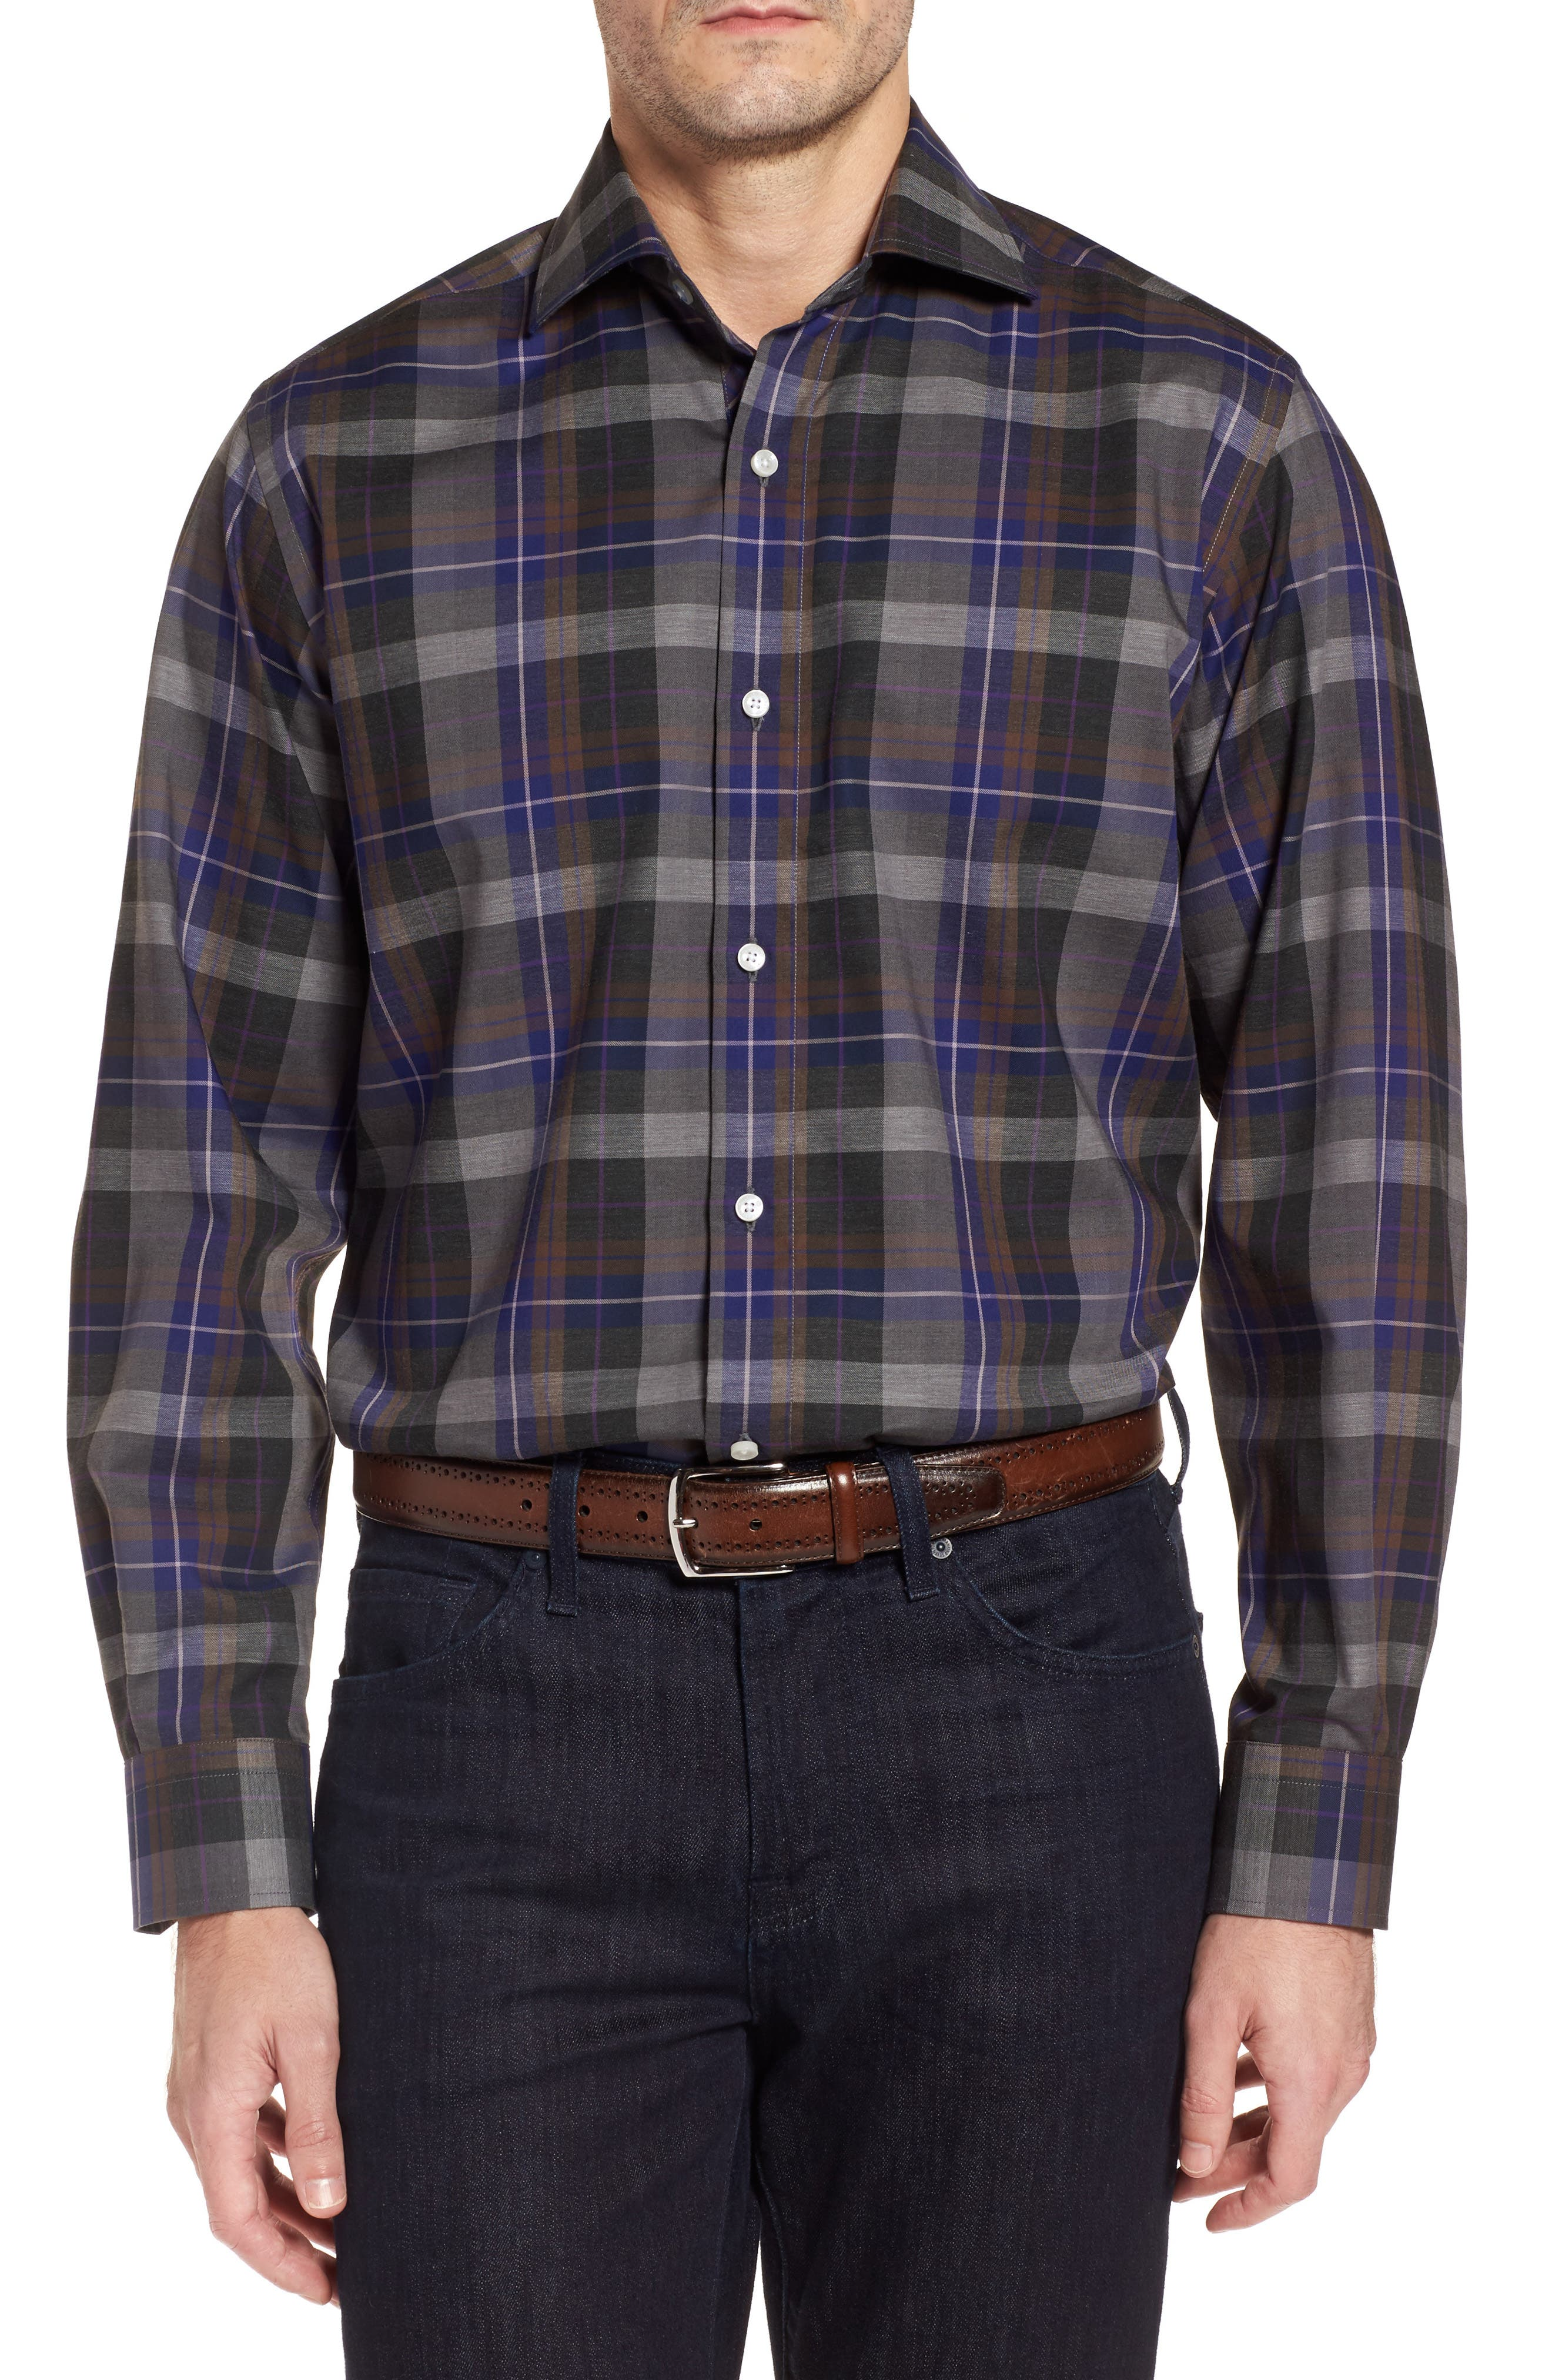 Main Image - TailorByrd Cullen Plaid Twill Sport Shirt